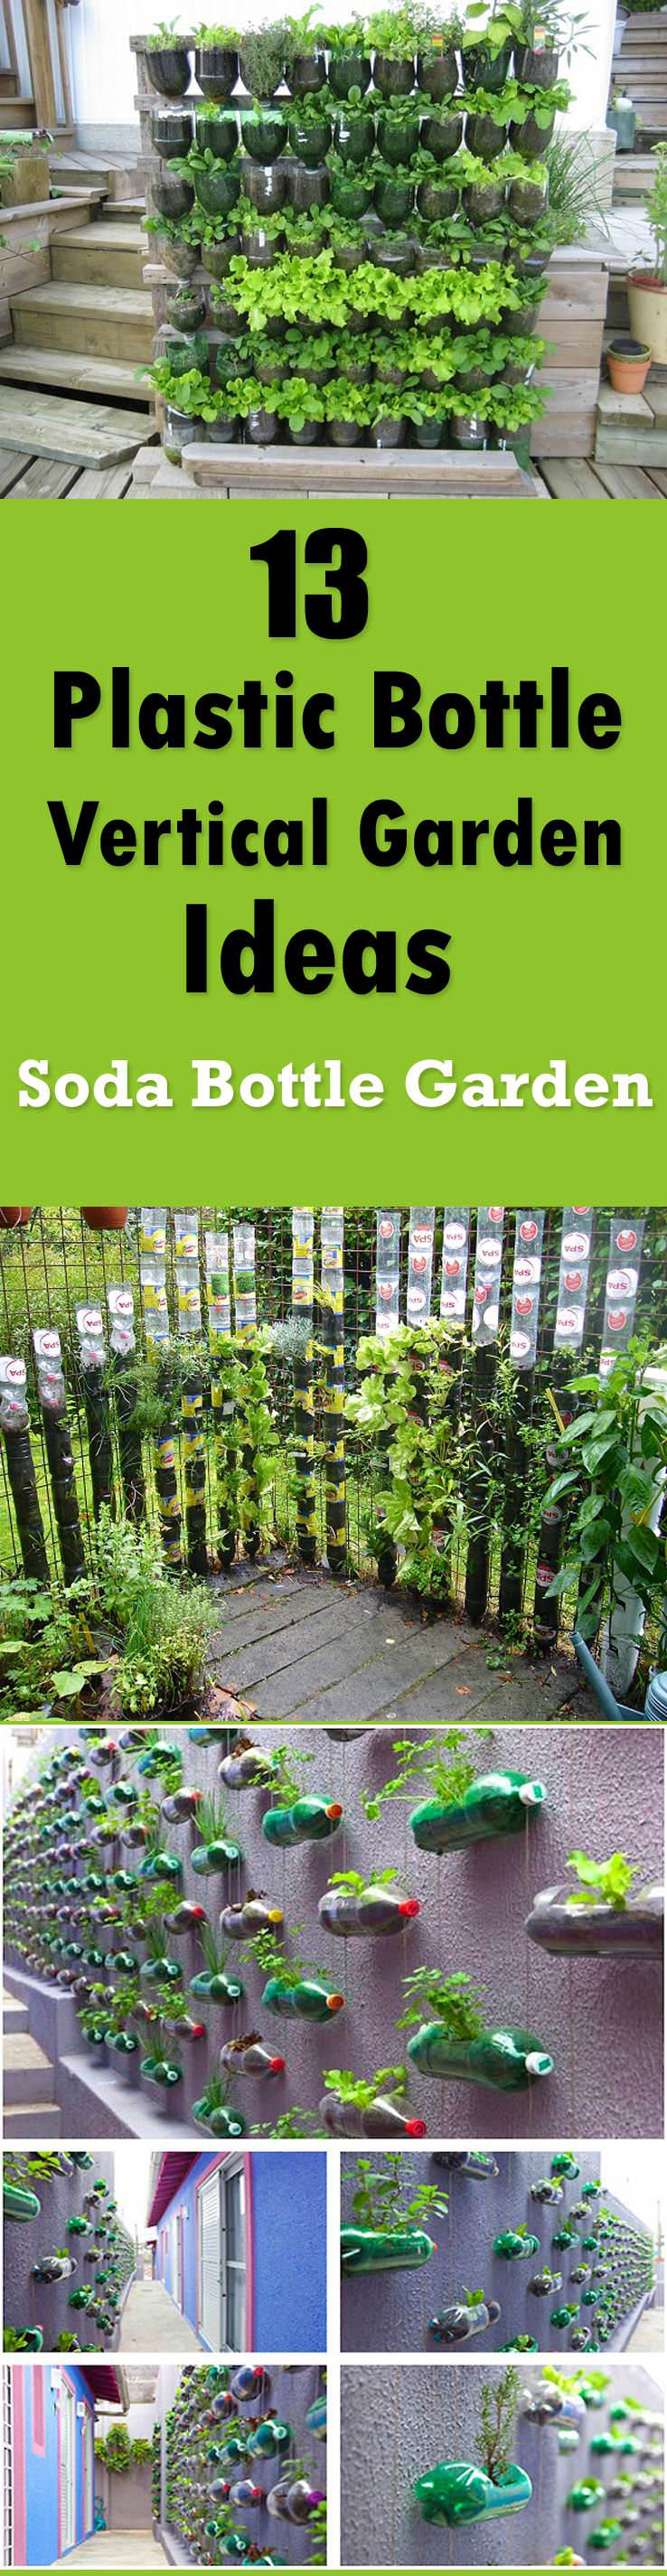 13 Plastic Bottle Vertical Garden Ideas Soda Strawberry Plant Diagram Verticle